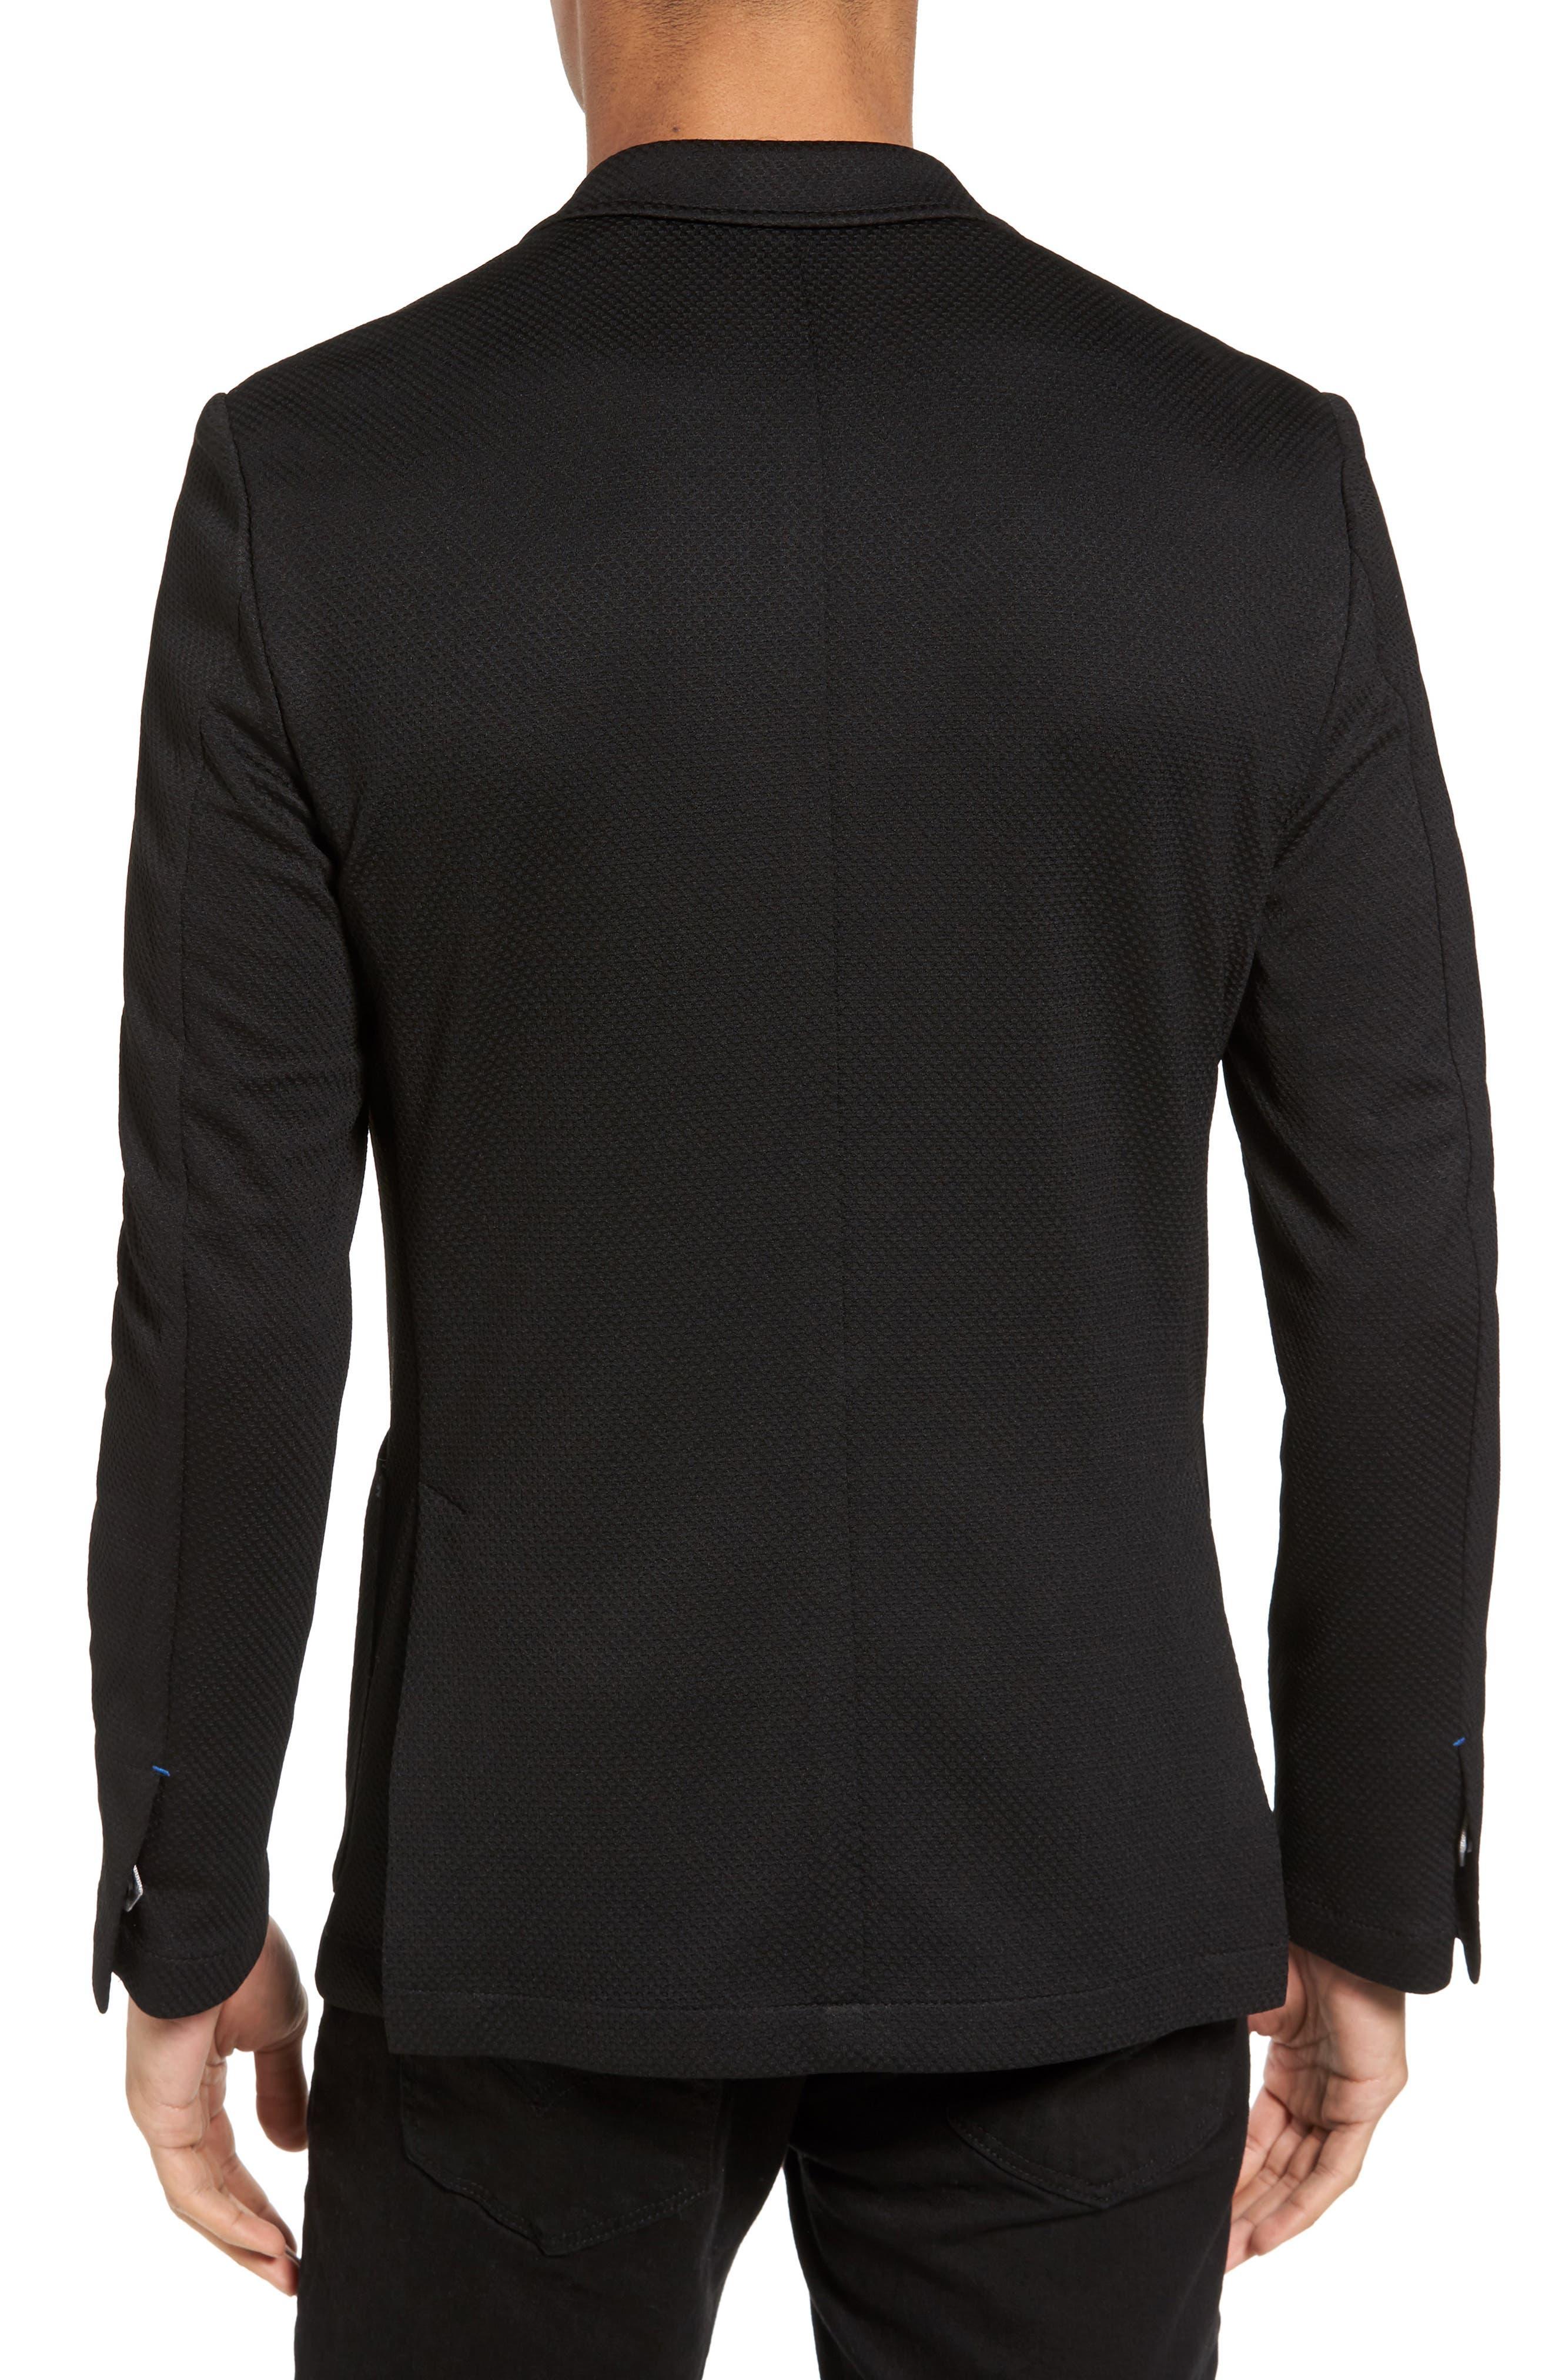 VINCE CAMUTO, Slim Fit Stretch Knit Sport Coat, Alternate thumbnail 2, color, BLACK